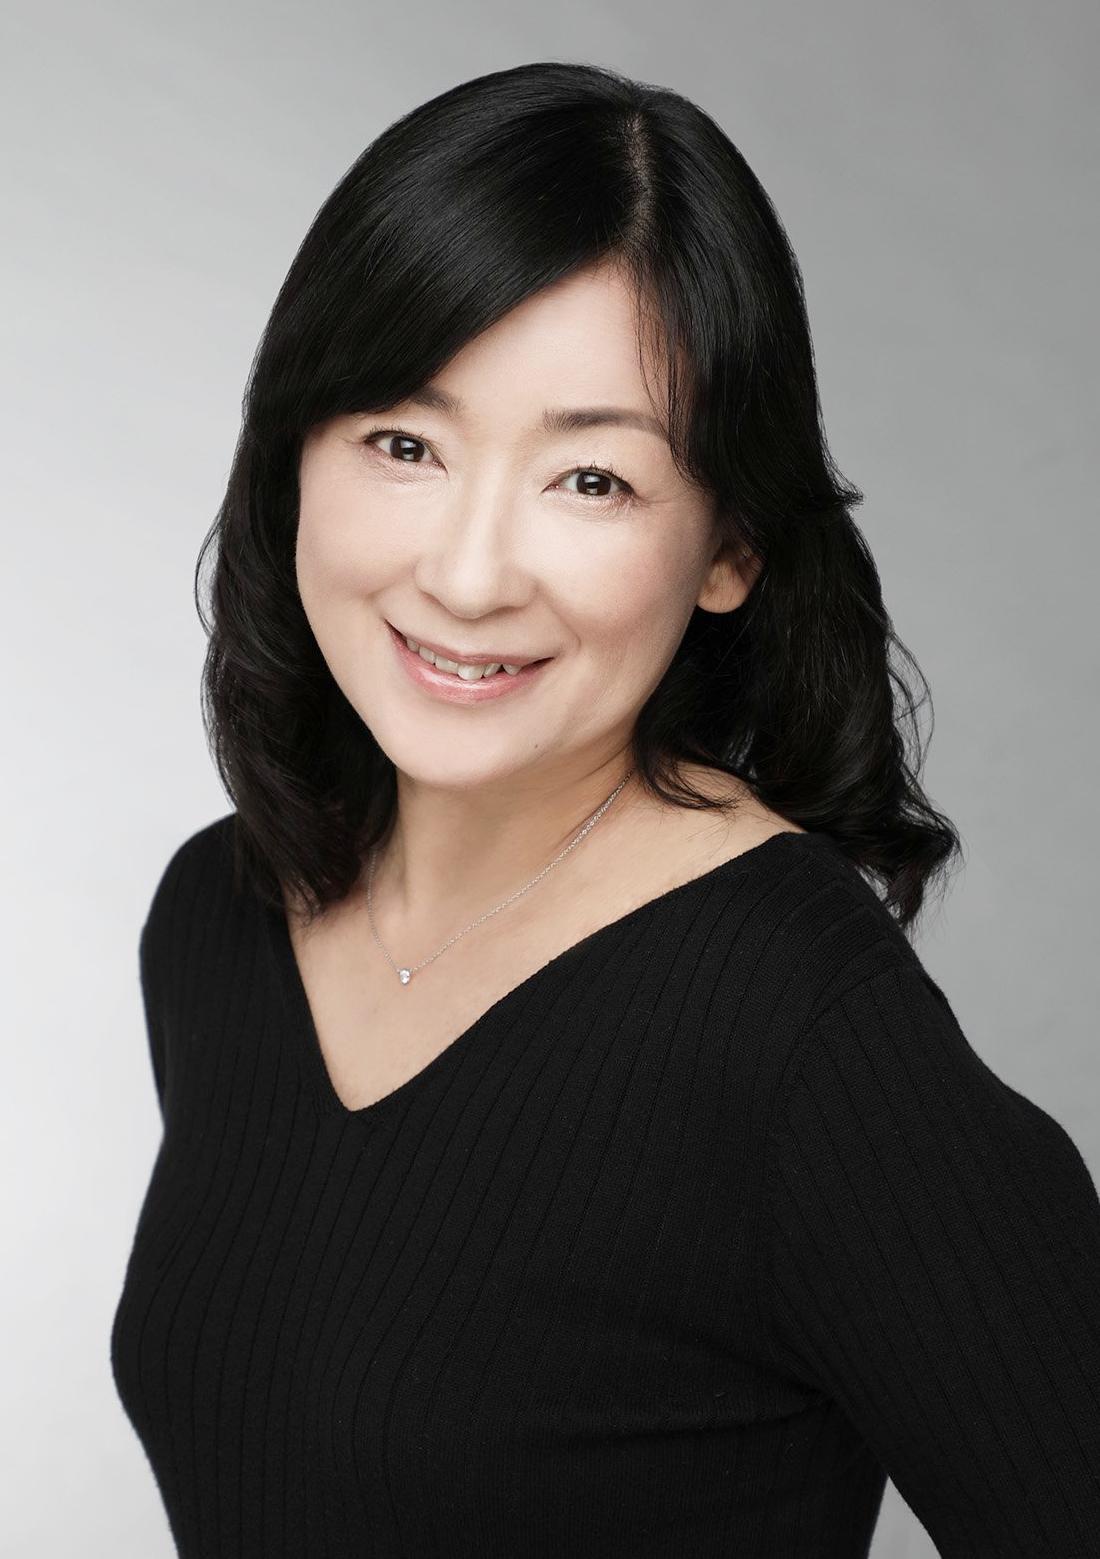 Yūko Minaguchi